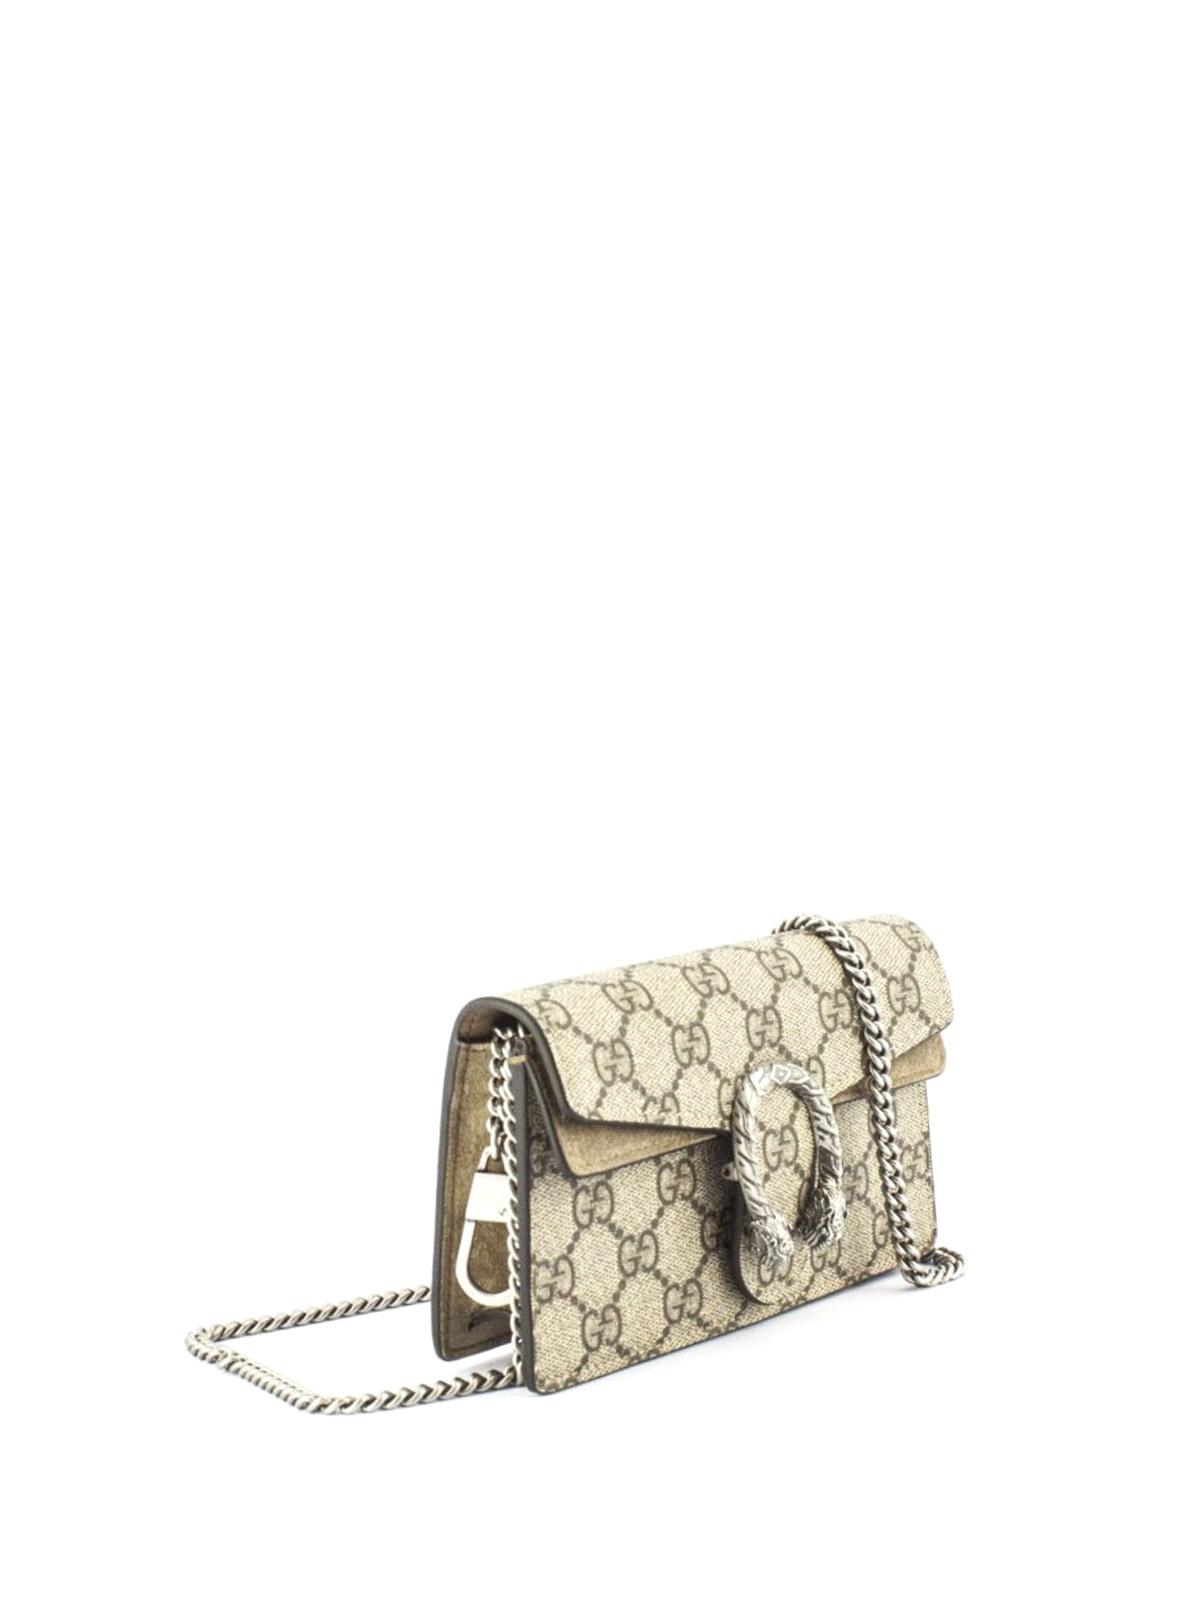 72480e4e81cd Gucci - Dionysus GG Supreme mini bag - clutches - 476432KHNRN8642